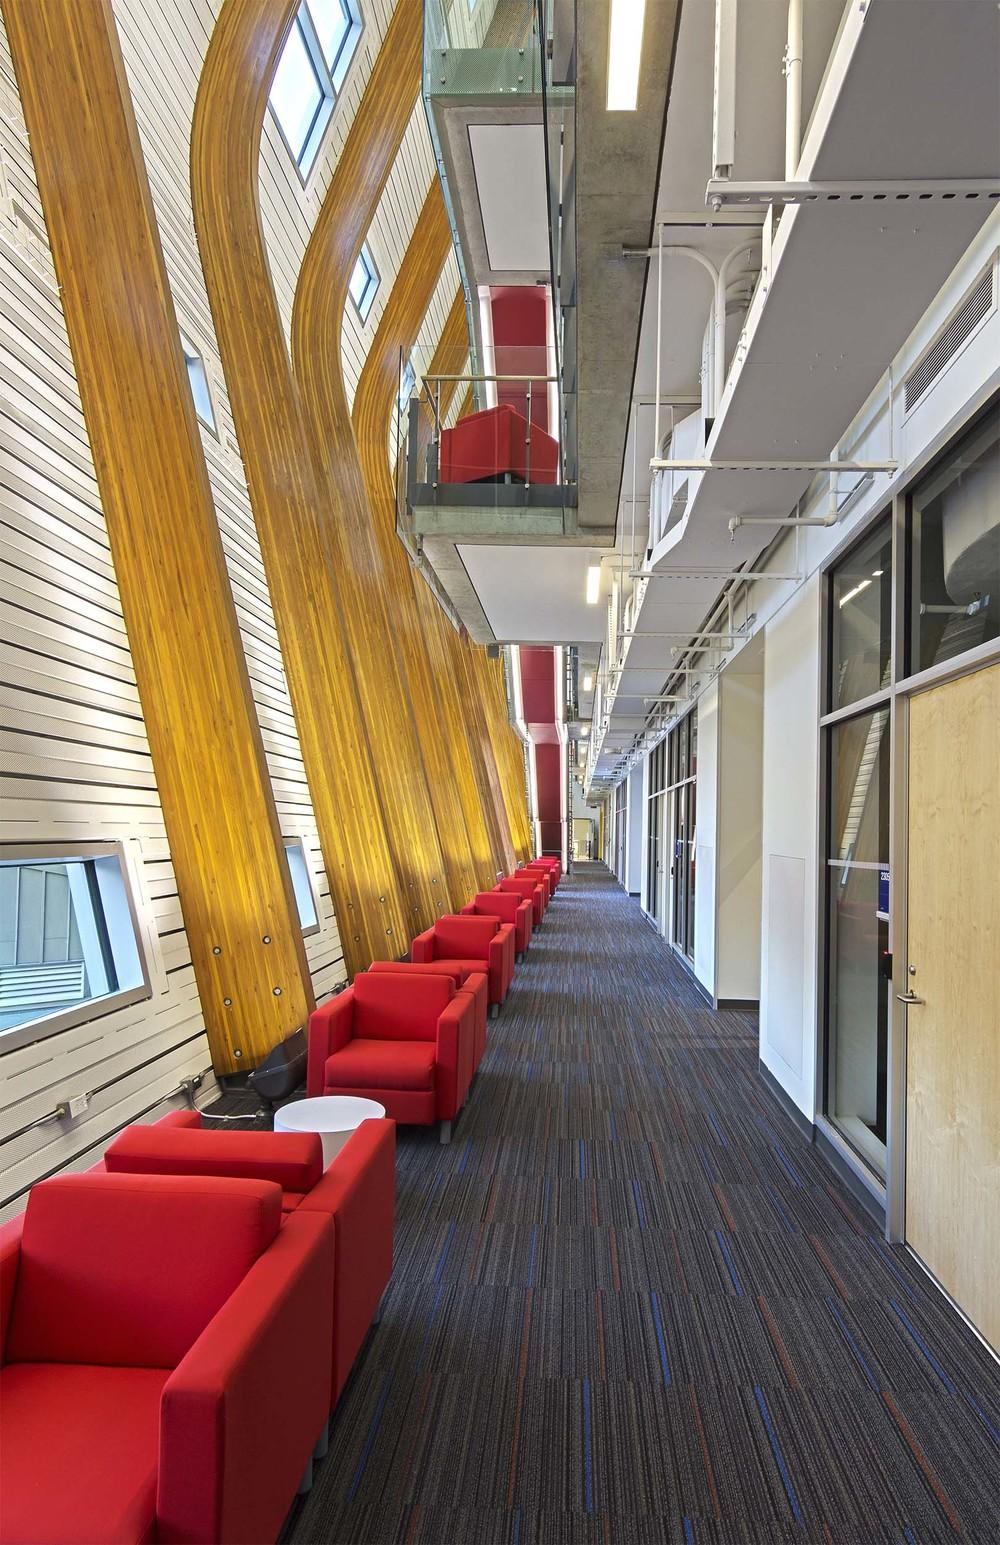 UBC Student Nest - Vancouver, Canada